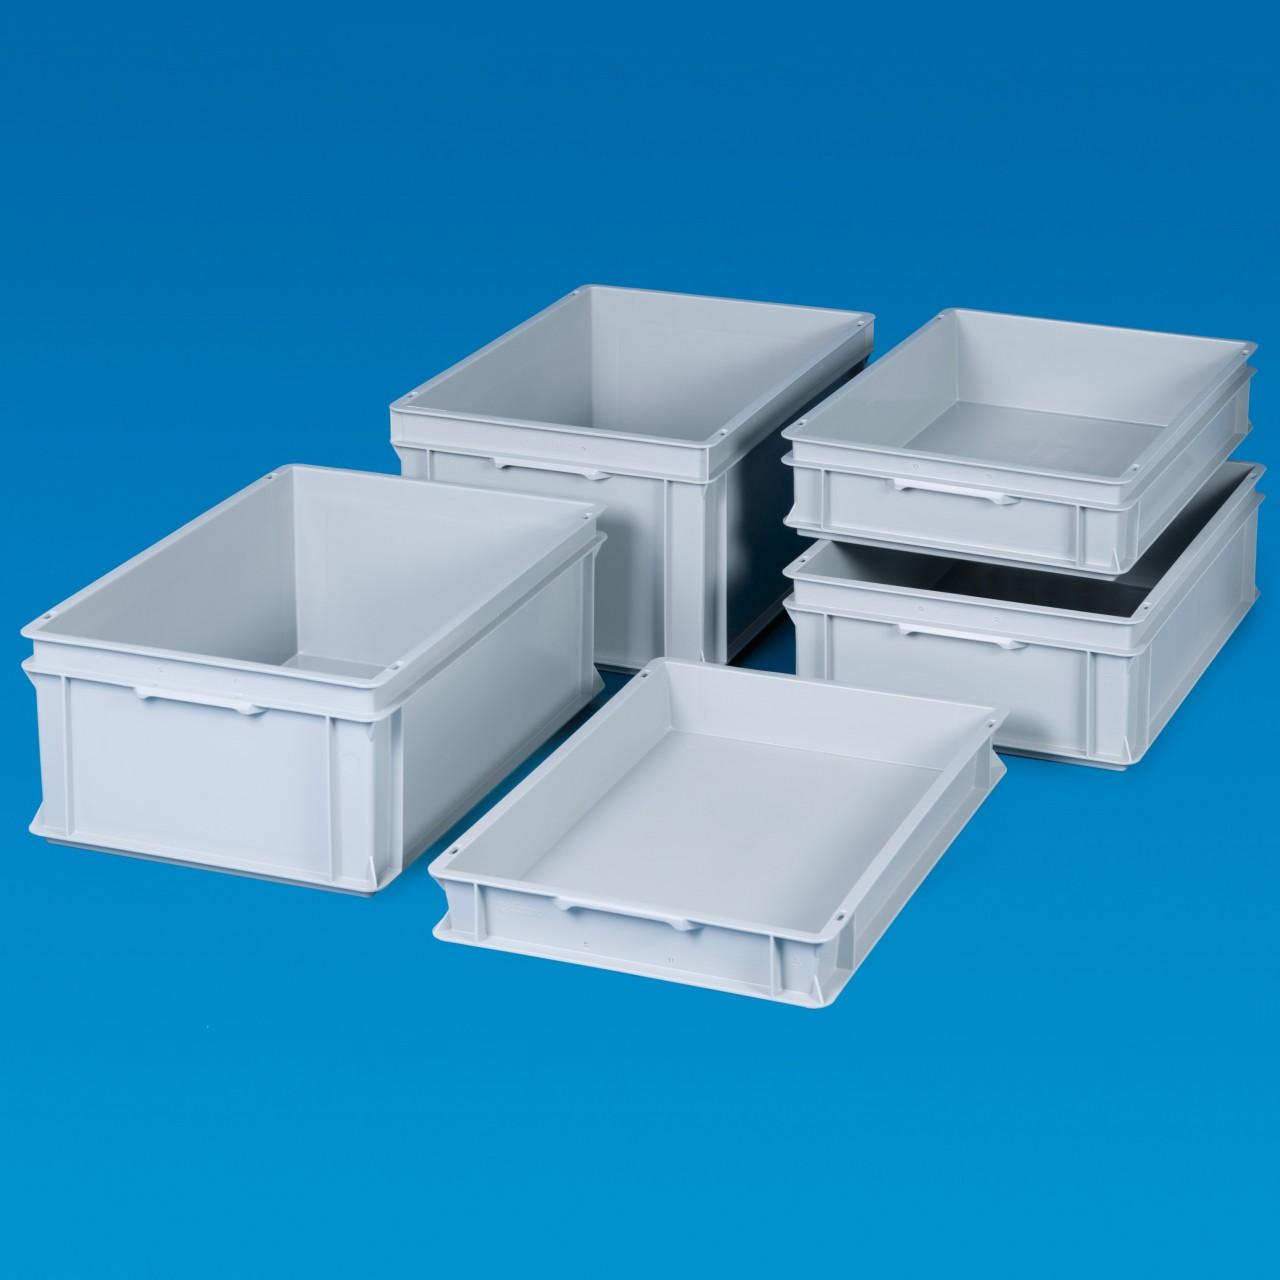 Rako-Behälter |Grundfläche 600 x 400 mm